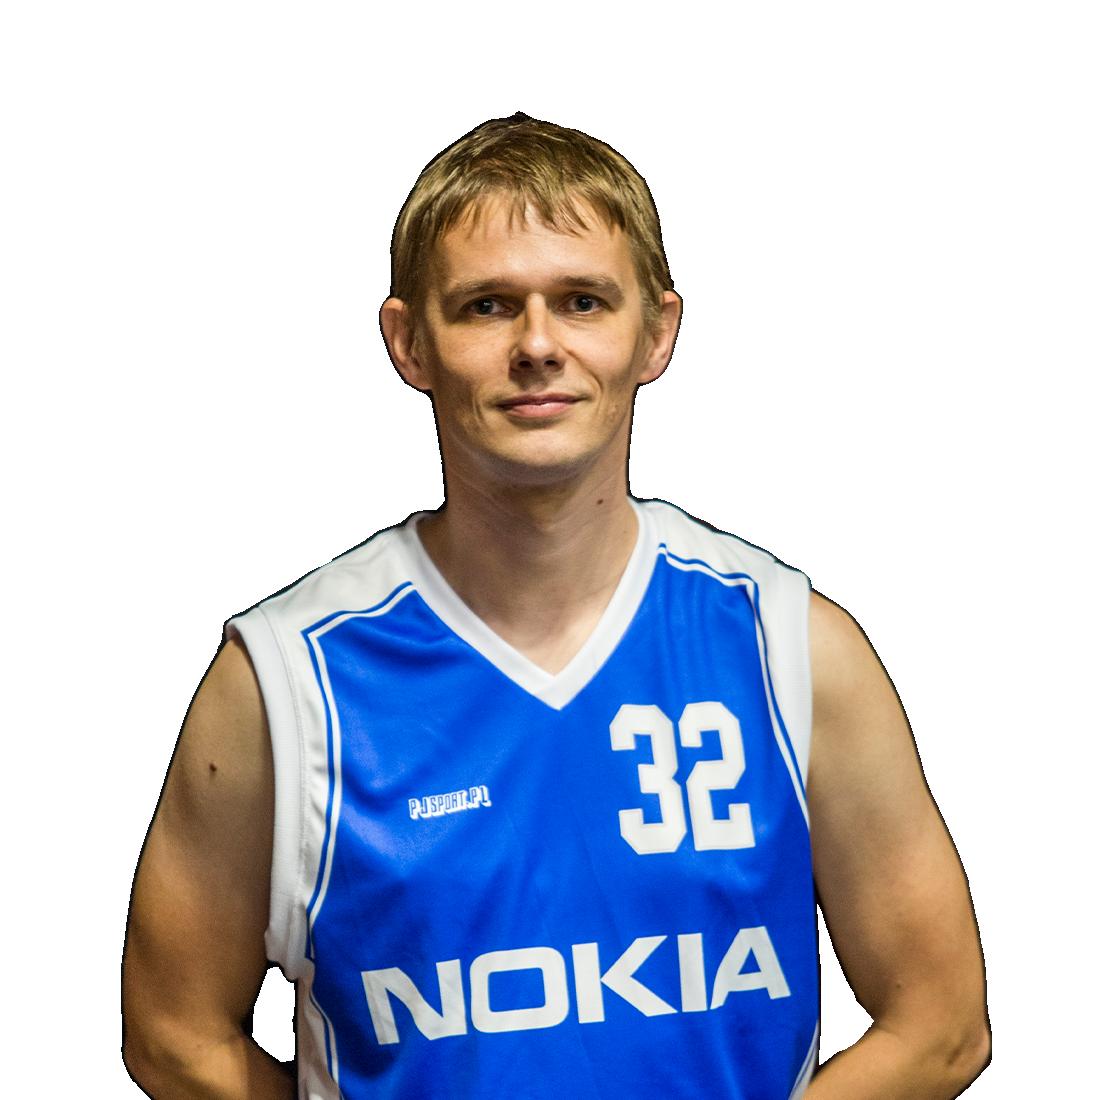 Tomasz Turski